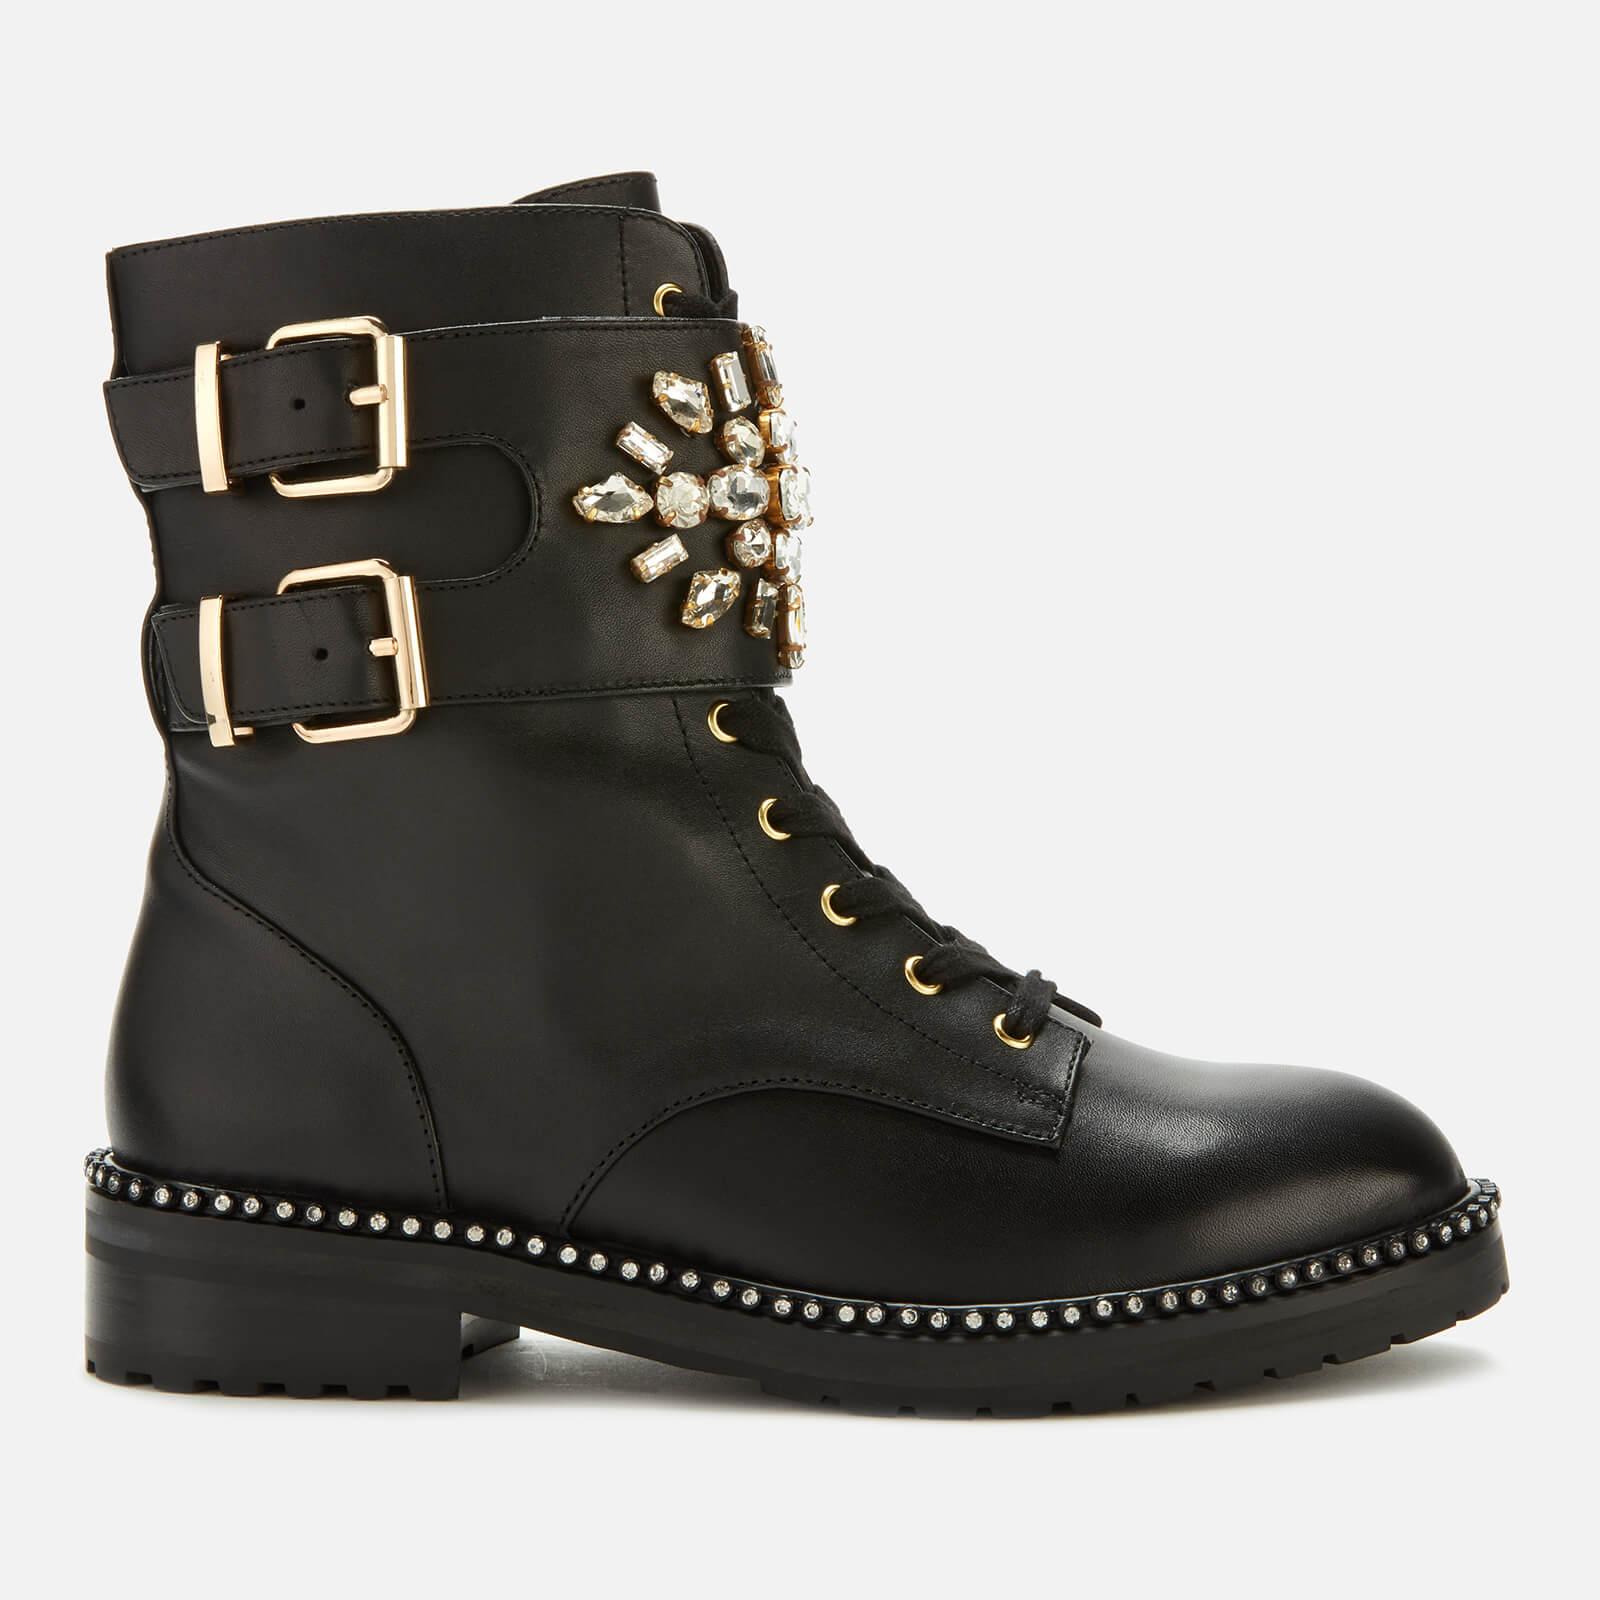 Kurt Geiger London Women's Stoop Leather Lace Up Boots - Black - UK 4